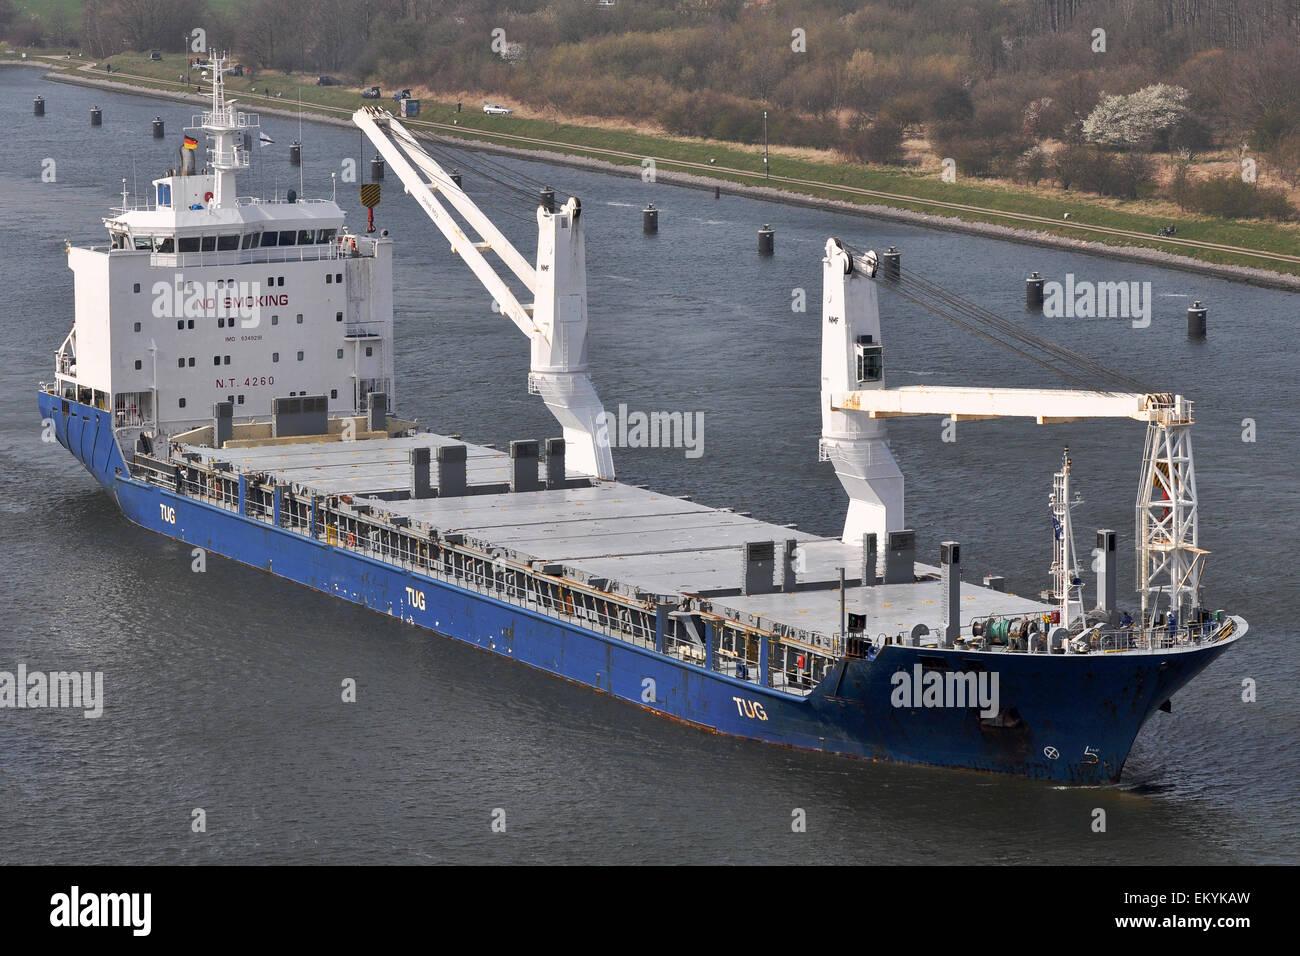 General cargo vessel Amber - Stock Image